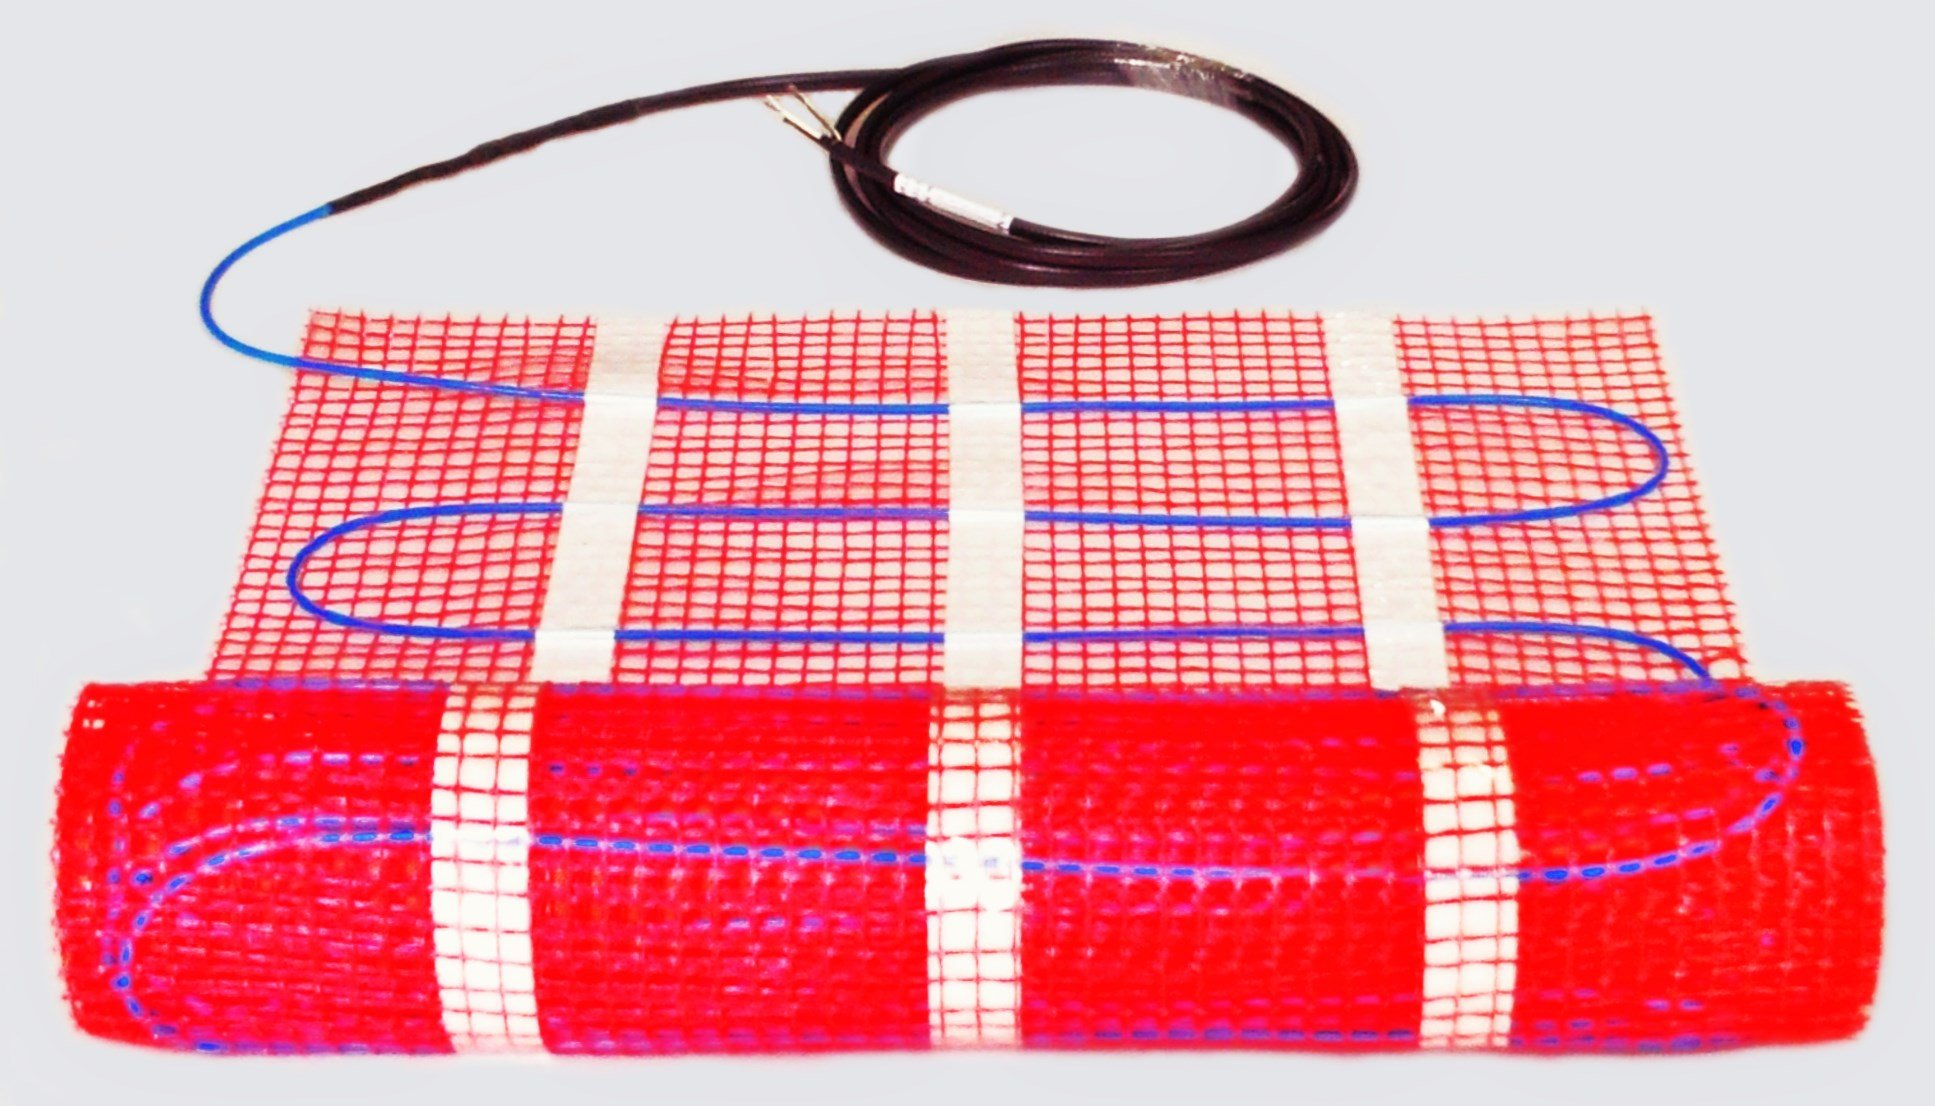 15 Sqft UL Listed 120v Electric Radiant Floor Heating Mat